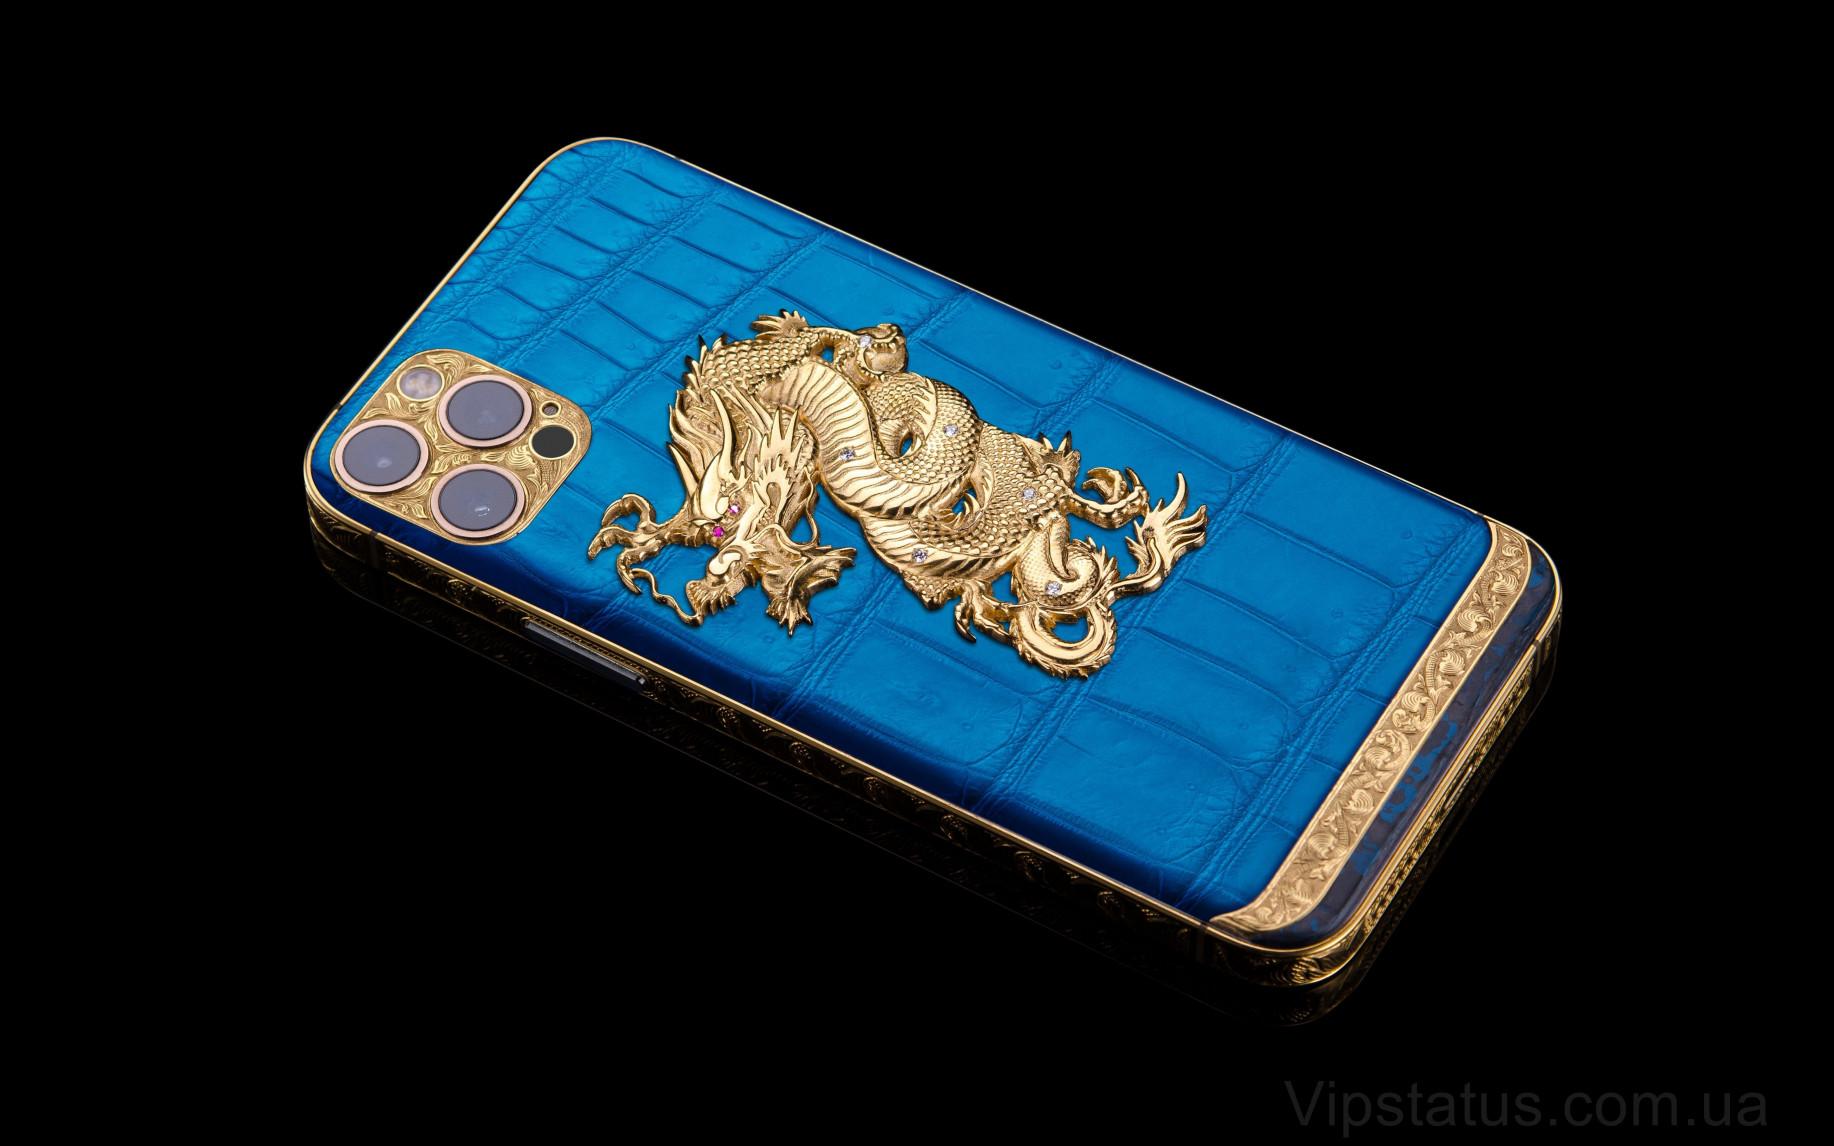 Elite Oriental Dragon IPHONE 12 PRO MAX 512 GB Oriental Dragon IPHONE 12 PRO MAX 512 GB image 9